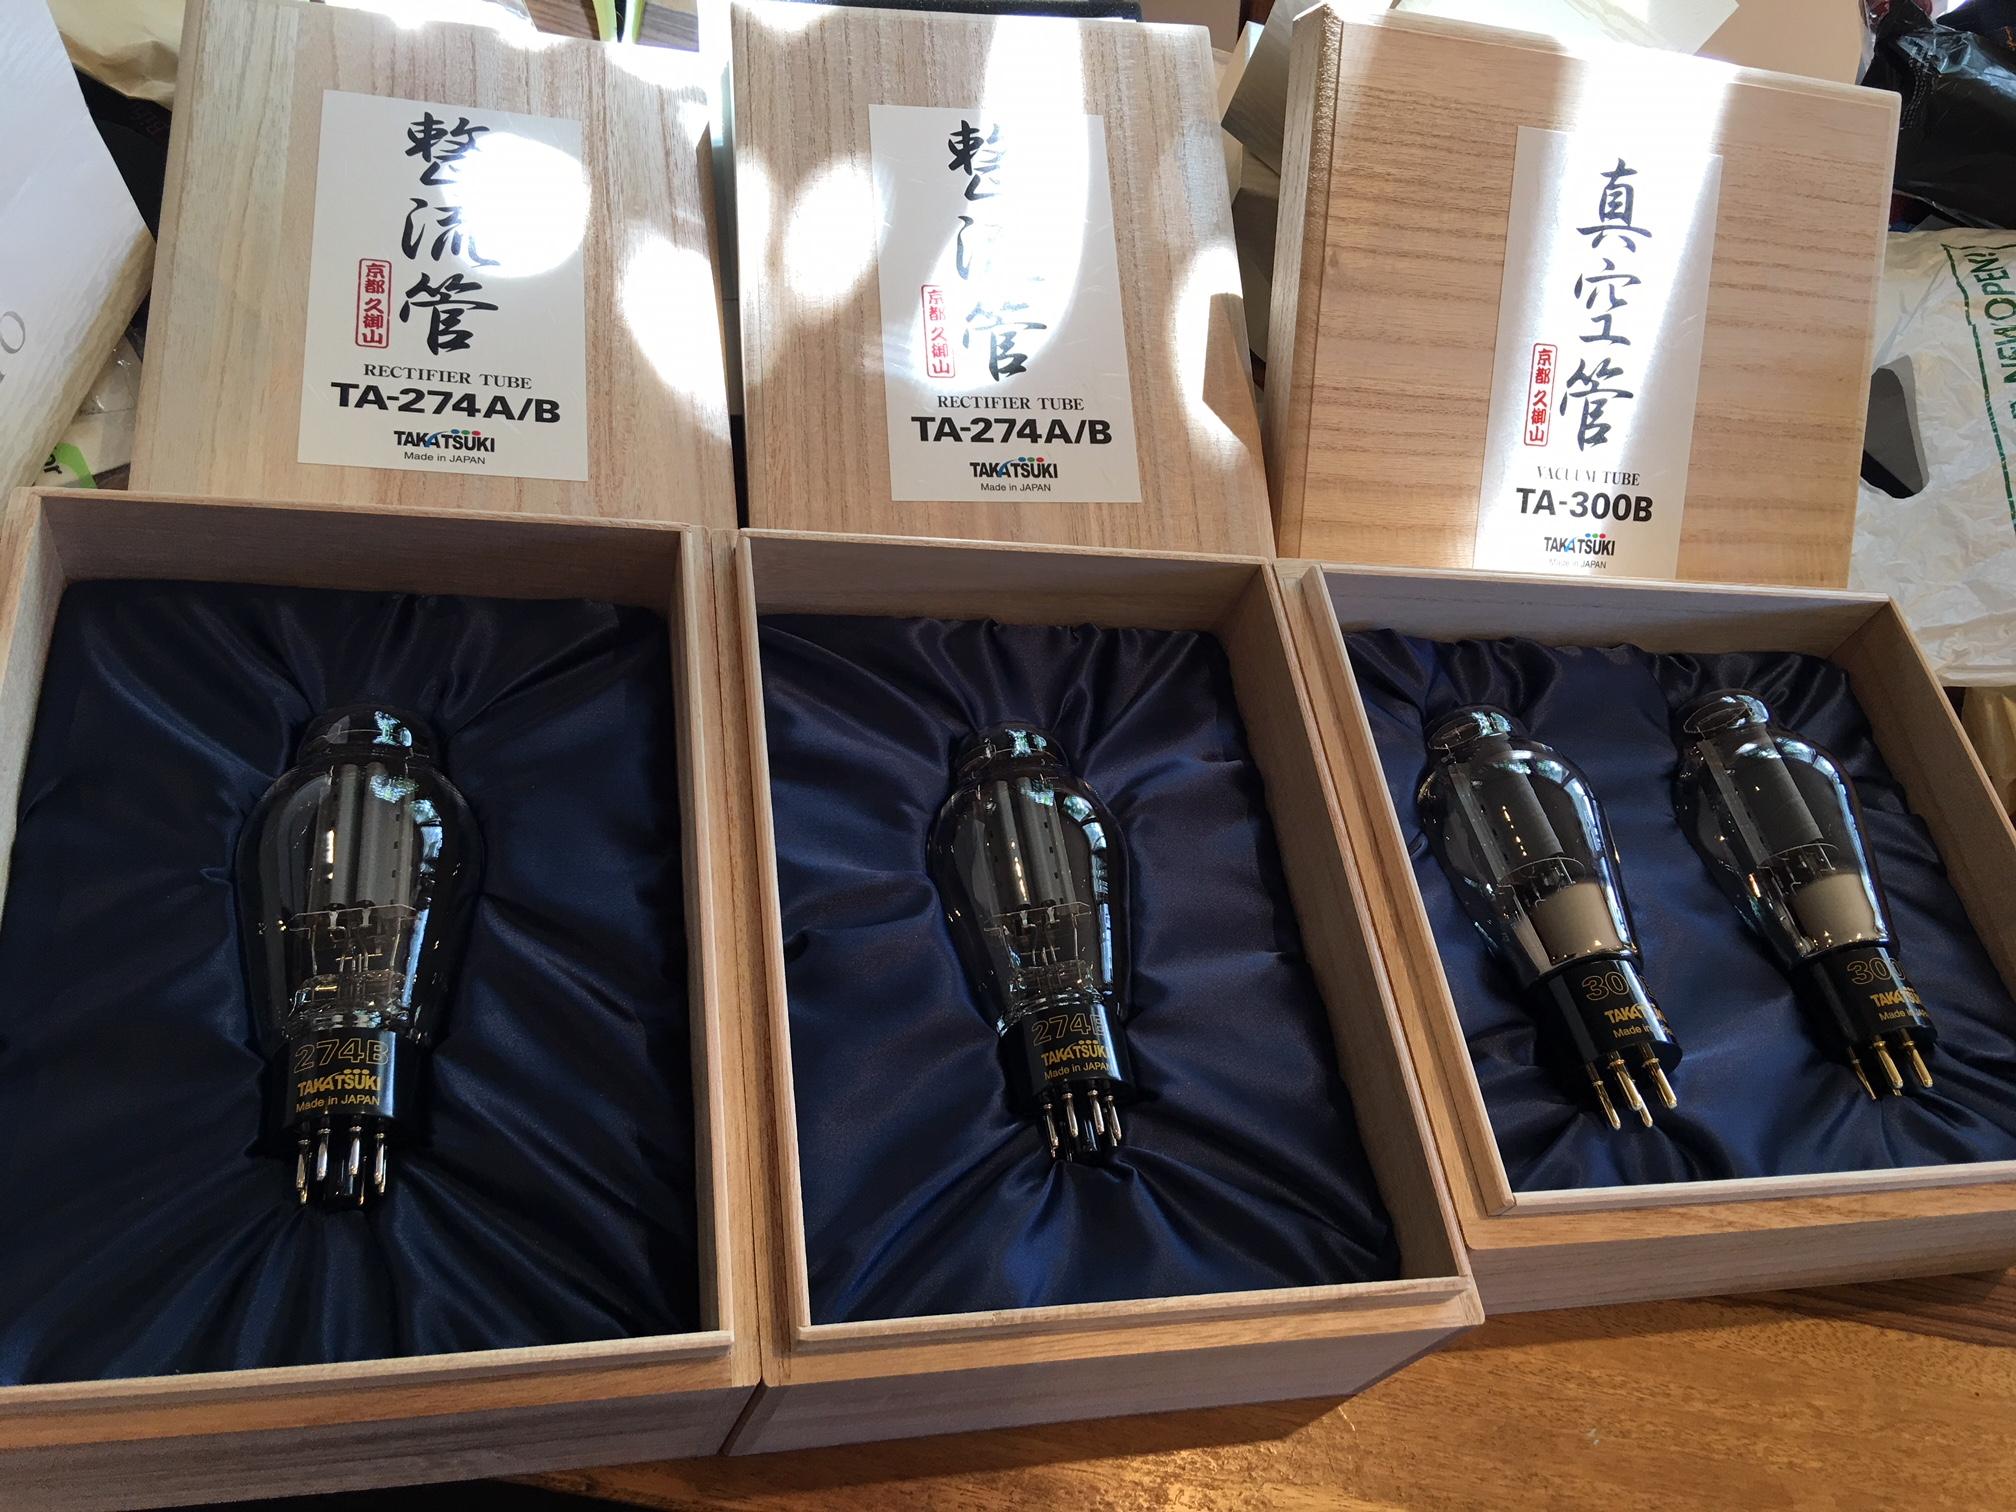 Takatsuki valves 300B & 274